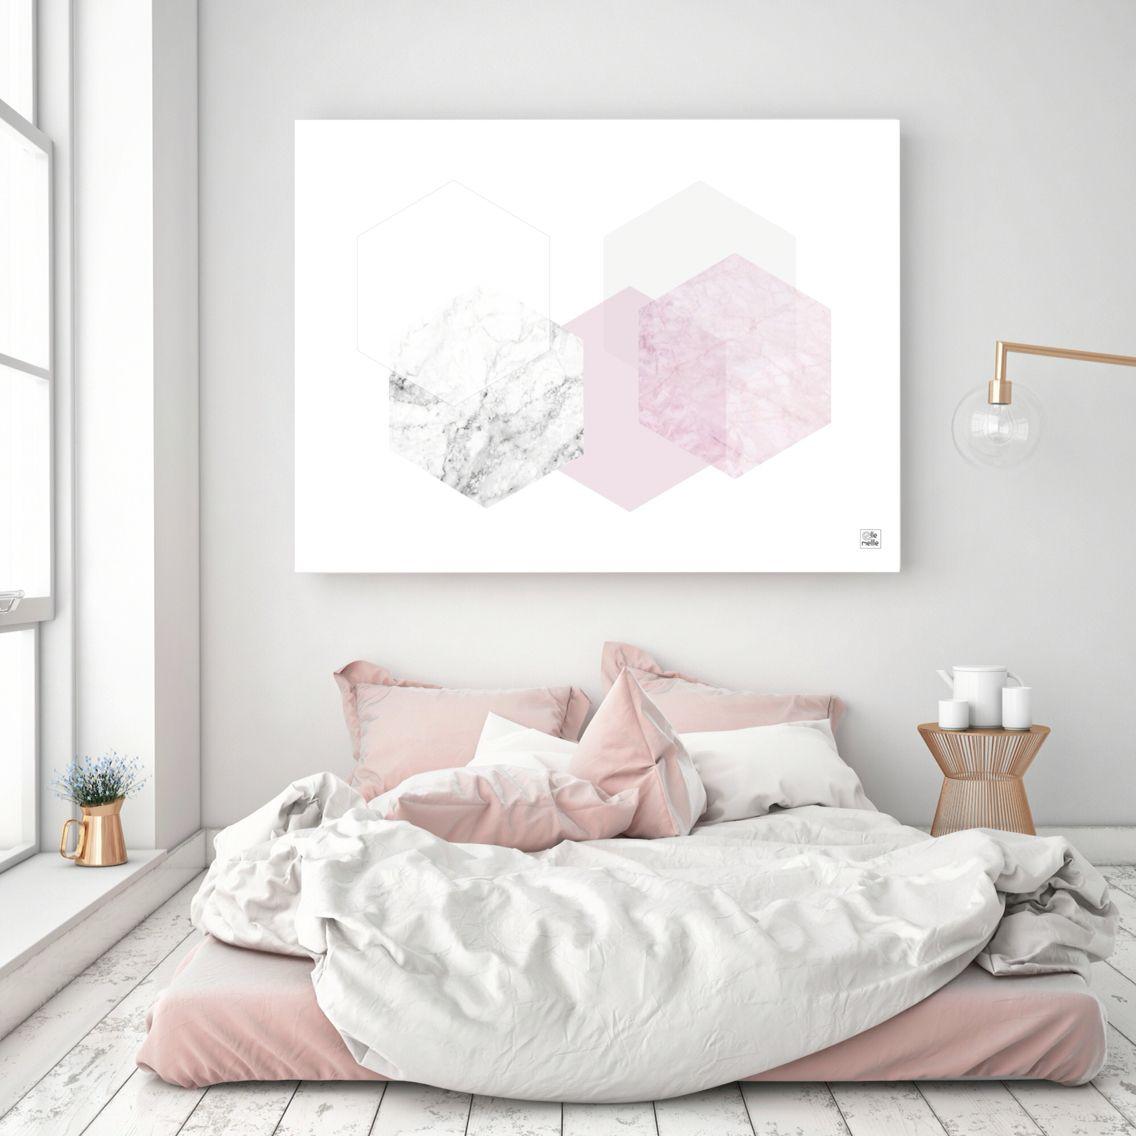 Bedroom interior wall decoration pink hex print ellemellle  room  pinterest  printing